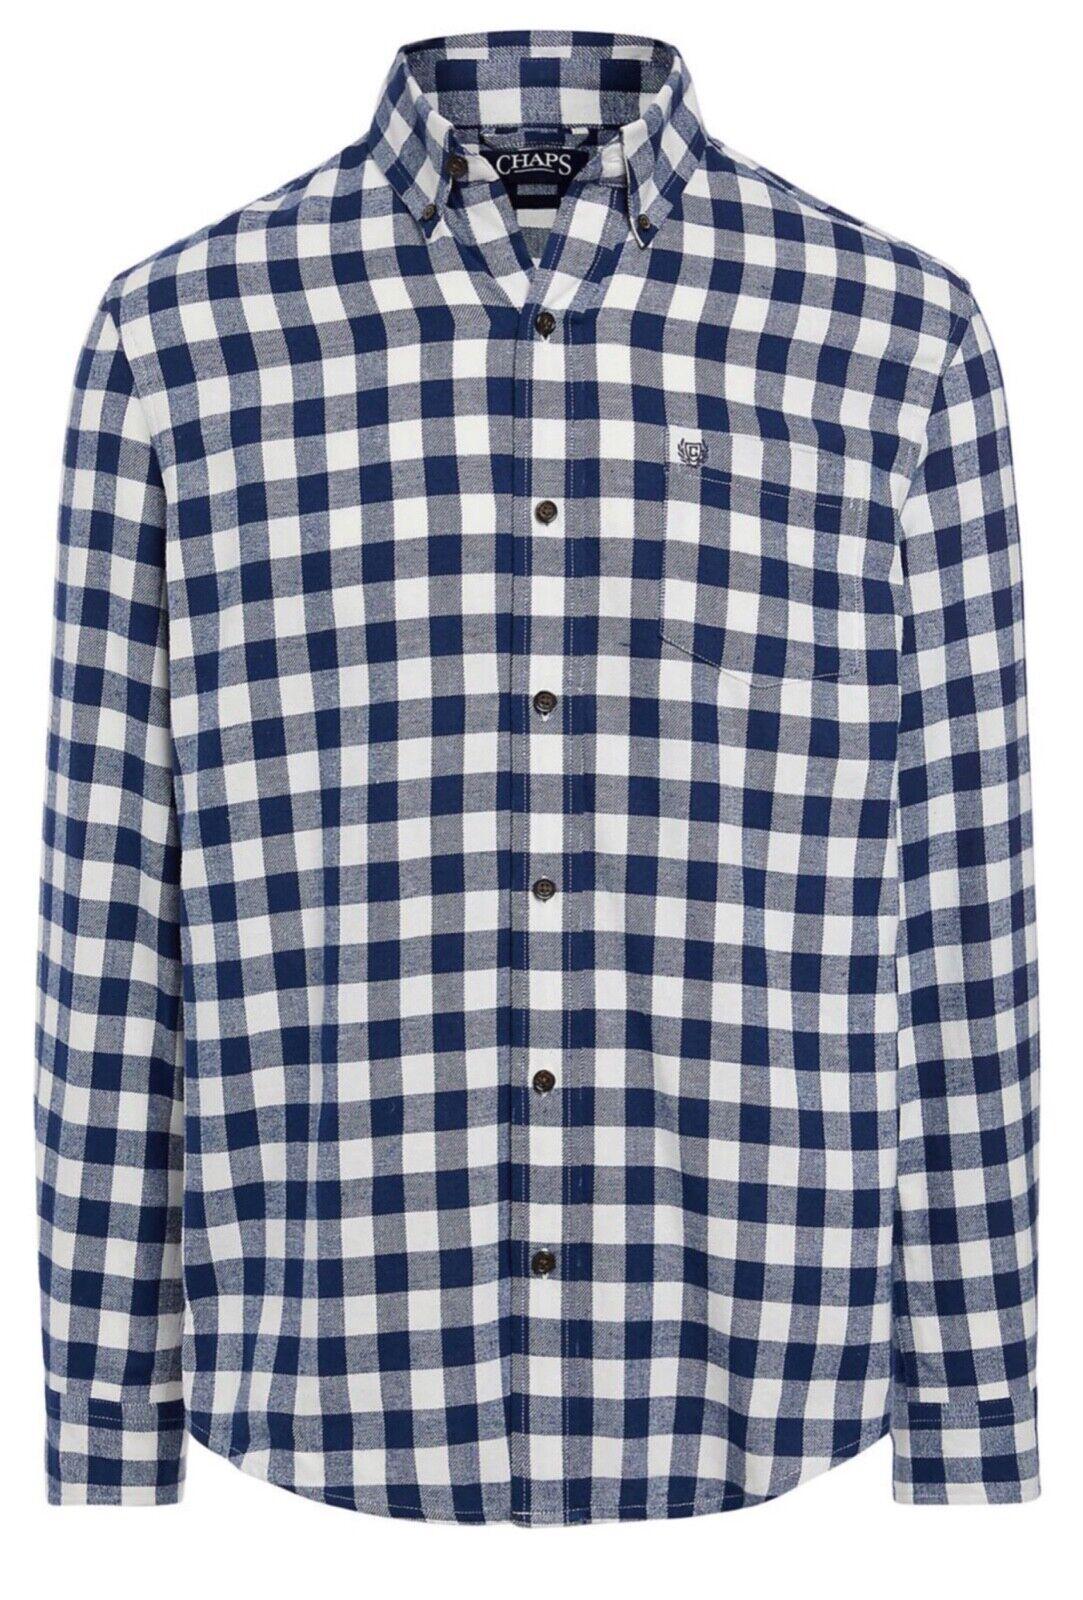 Men's Chaps Performance Flannel Shirt— Medieval Blue: Ch